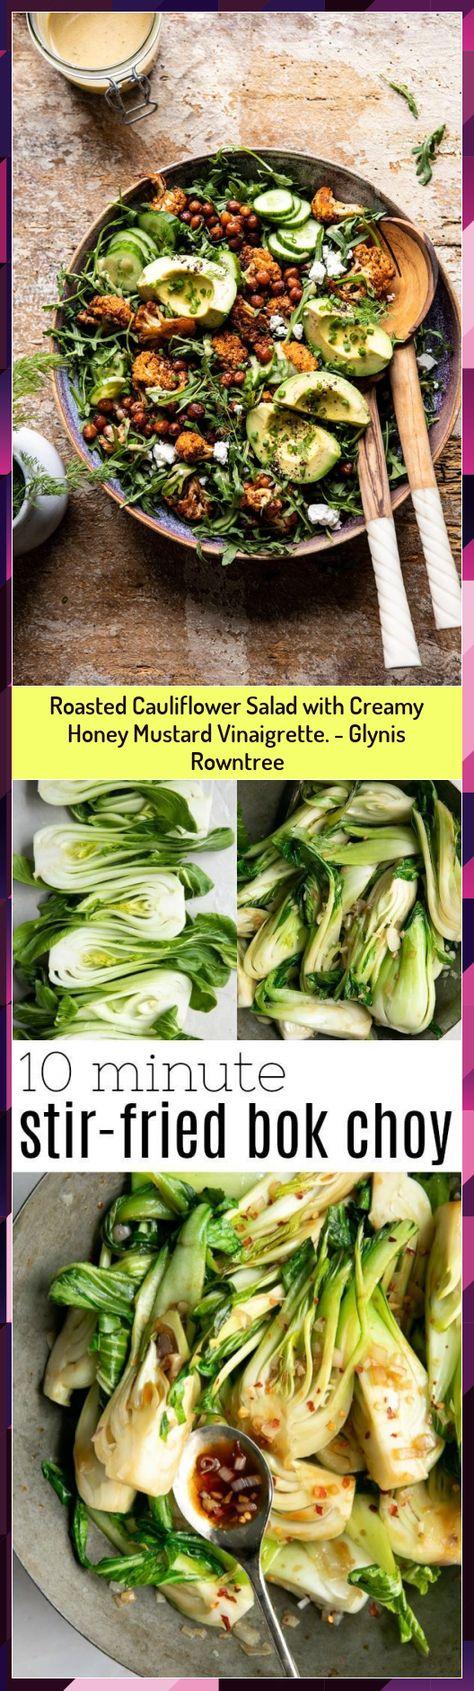 Roasted Cauliflower Salad with Creamy Honey Mustard Vinaigrette. - Glynis Rowntree #Cauliflower #Creamy #Glynis #Honey #Mustard #Roasted #Rowntree #Salad #Vinaigrette